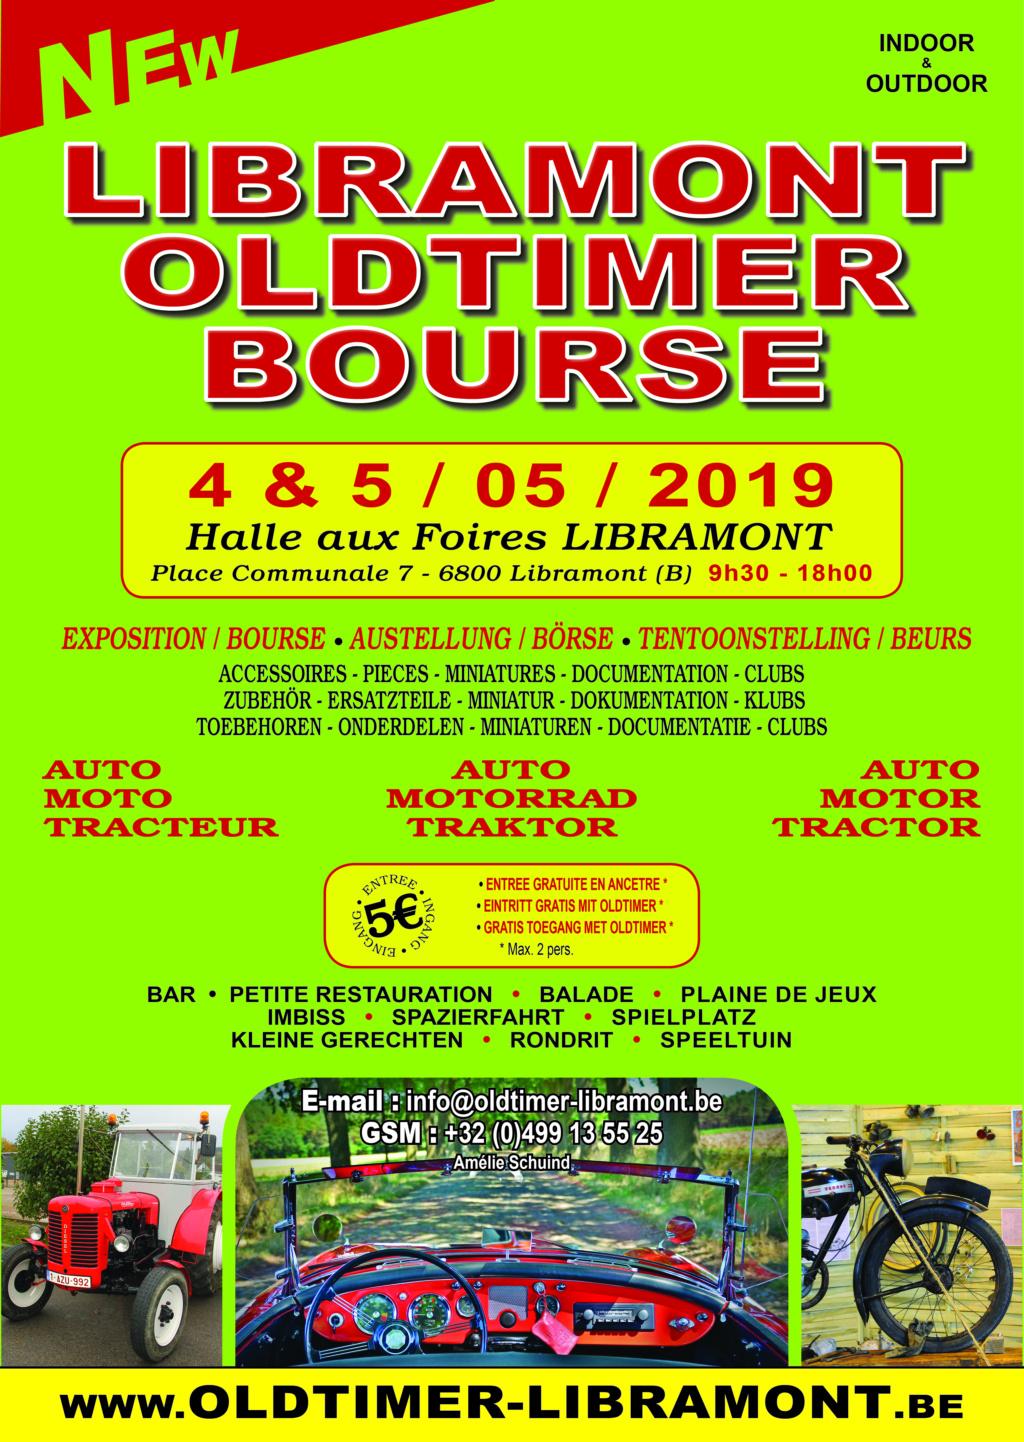 Libramont Oldtimer bourse - 4 & 5 mai 2019 Visuel10